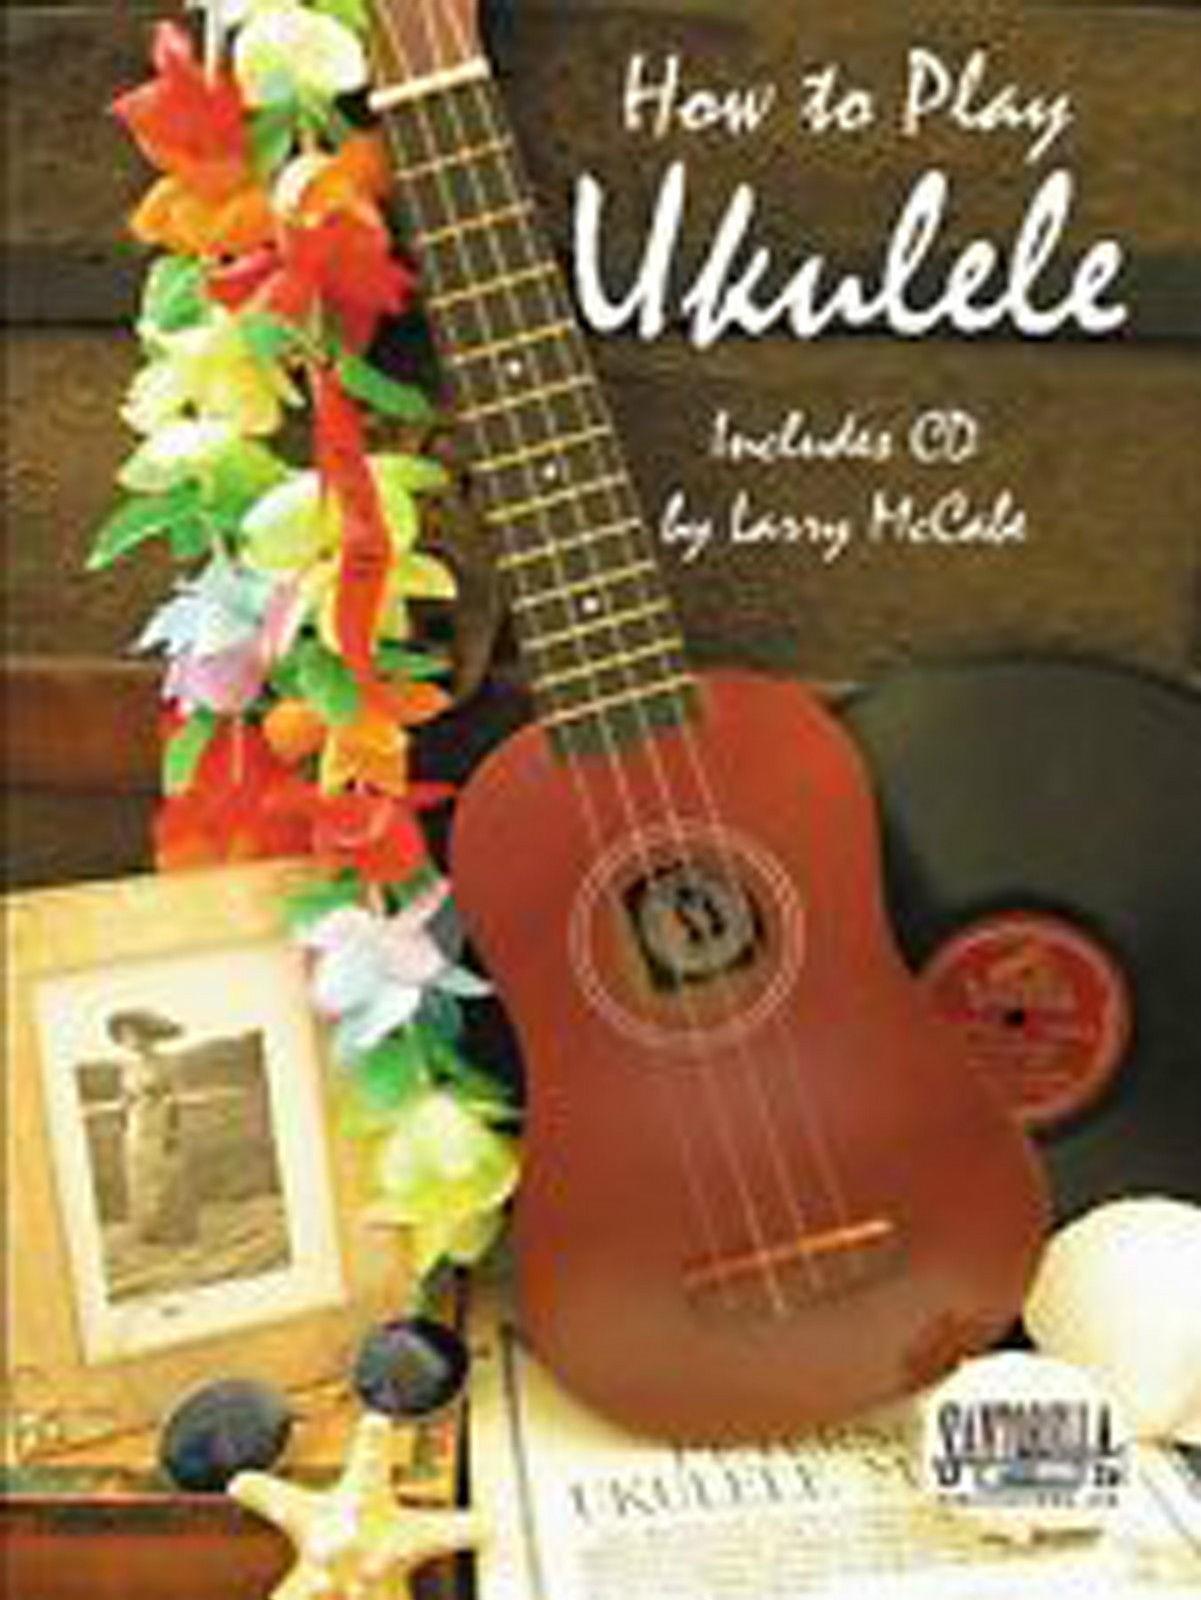 How To Play Ukulele Larry McCabe Beginner Tutor Book & CD B52